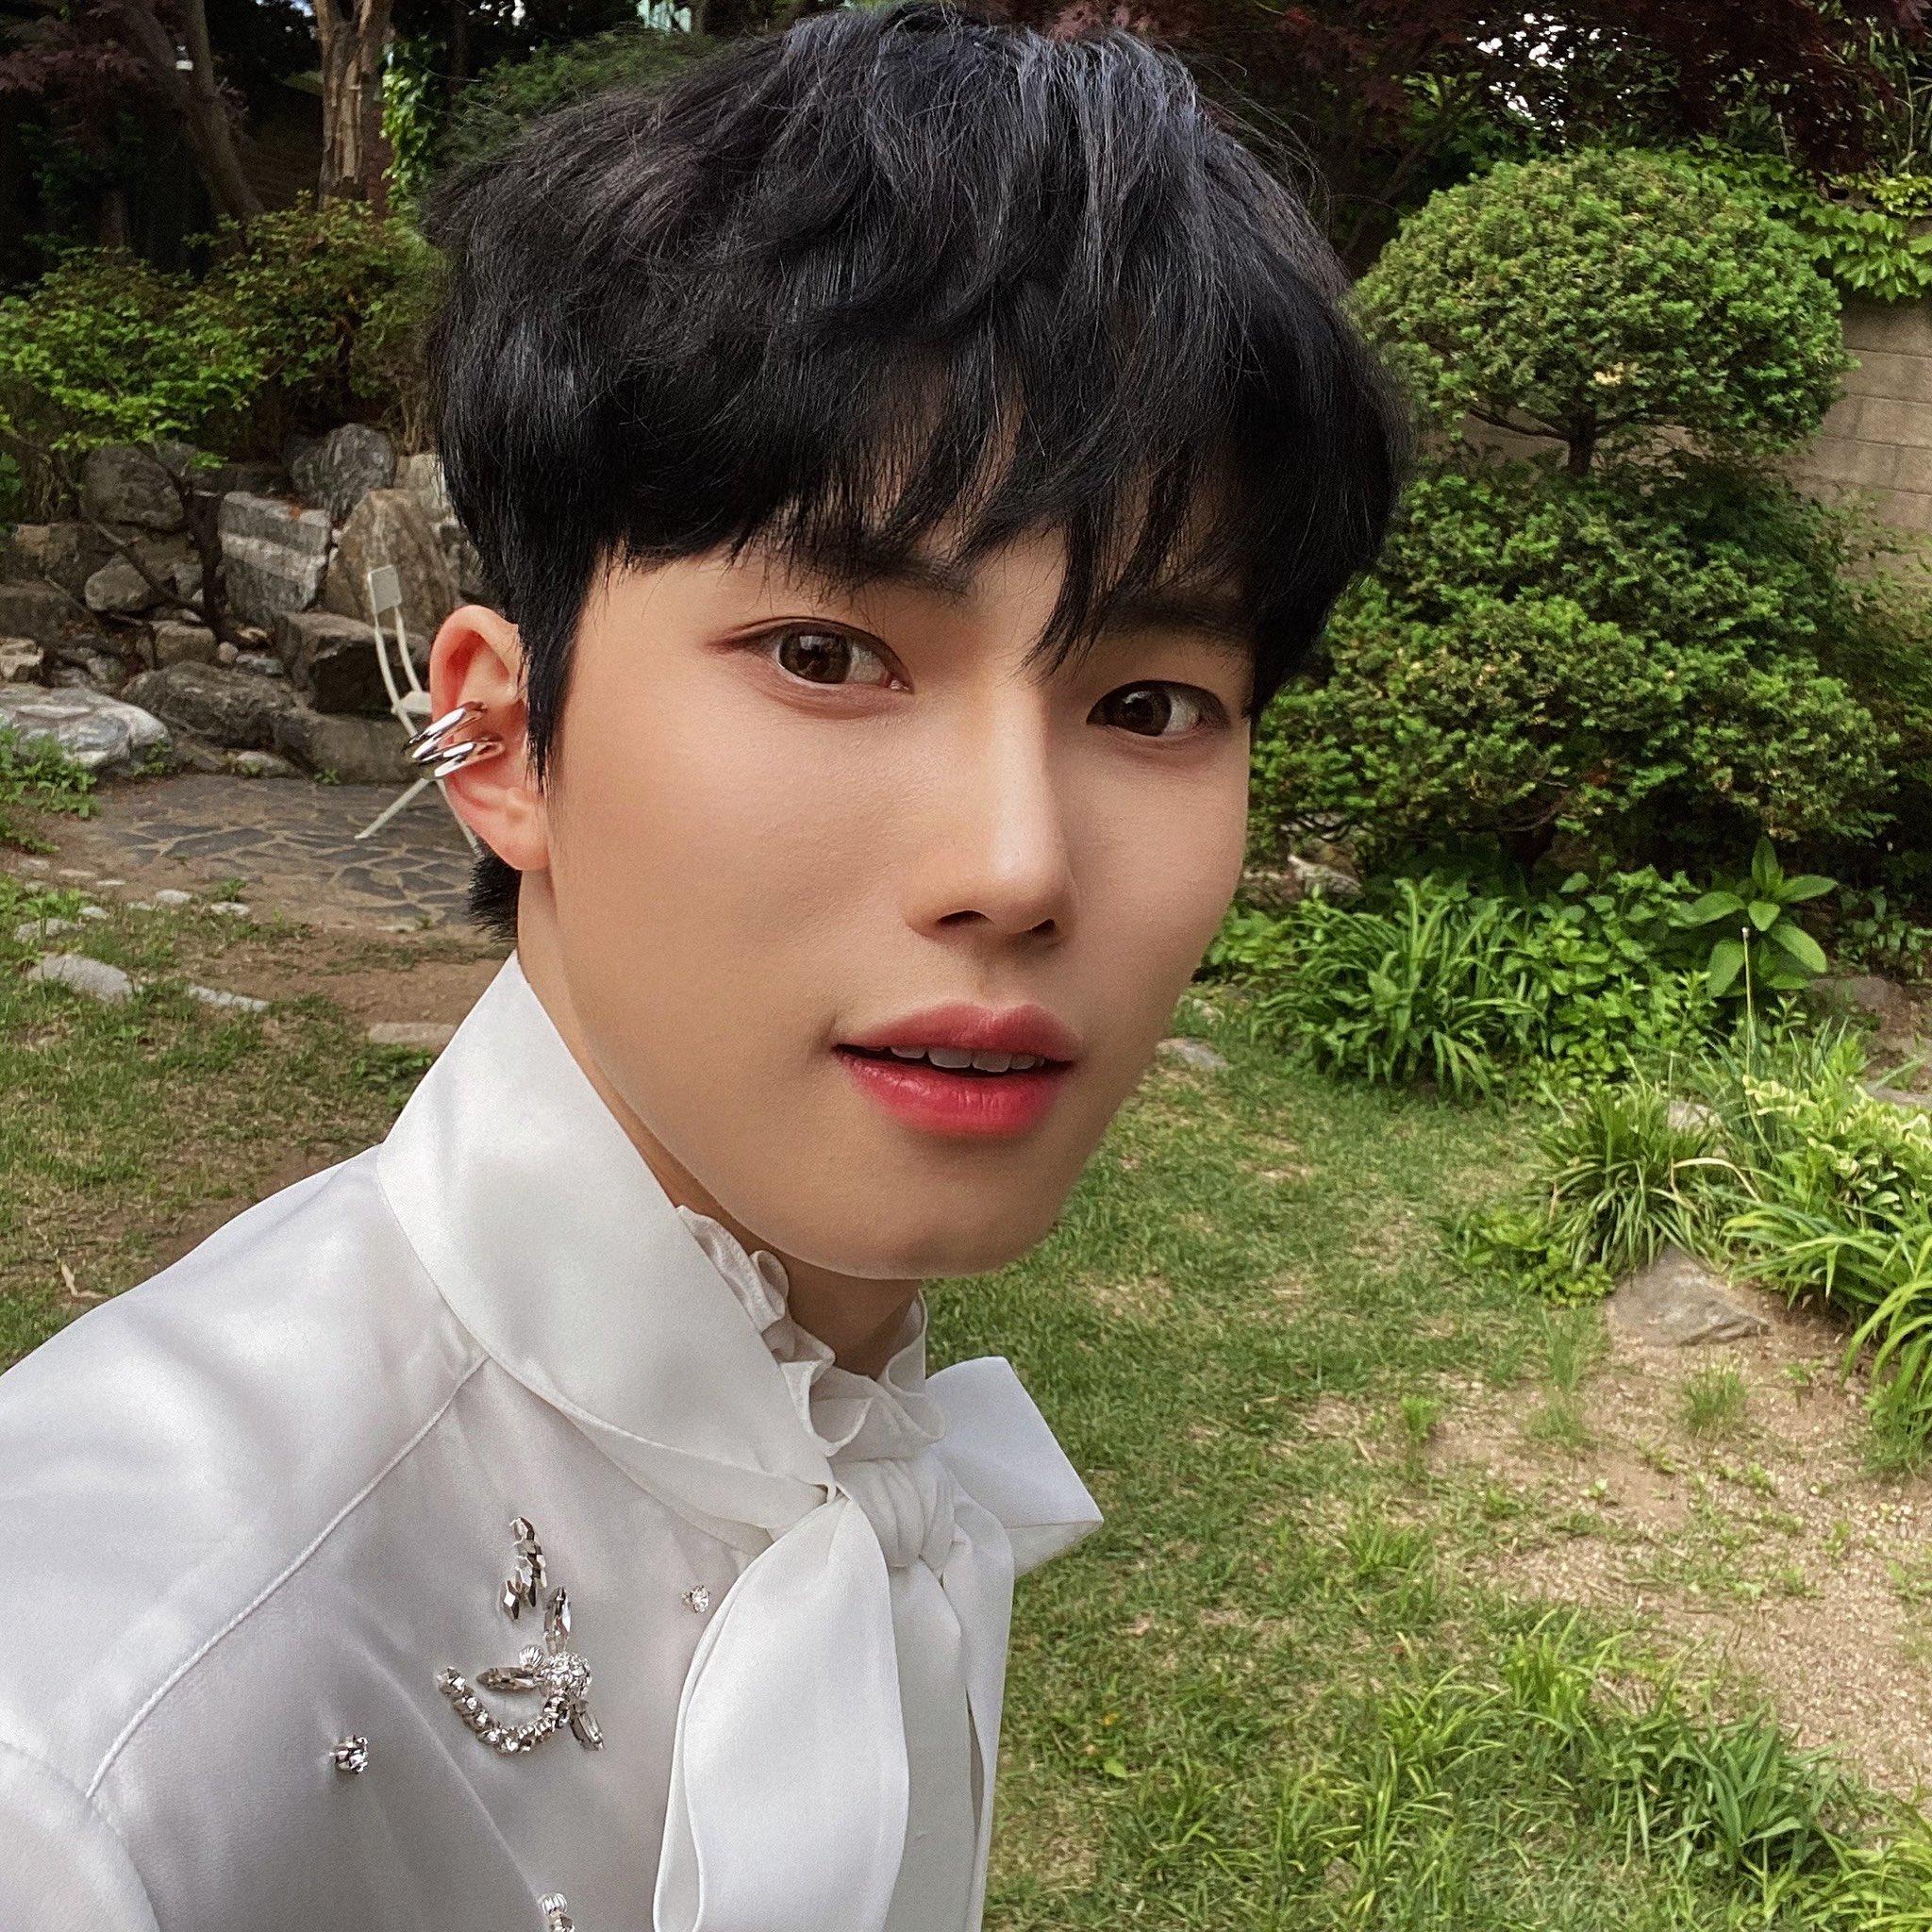 seungyeop